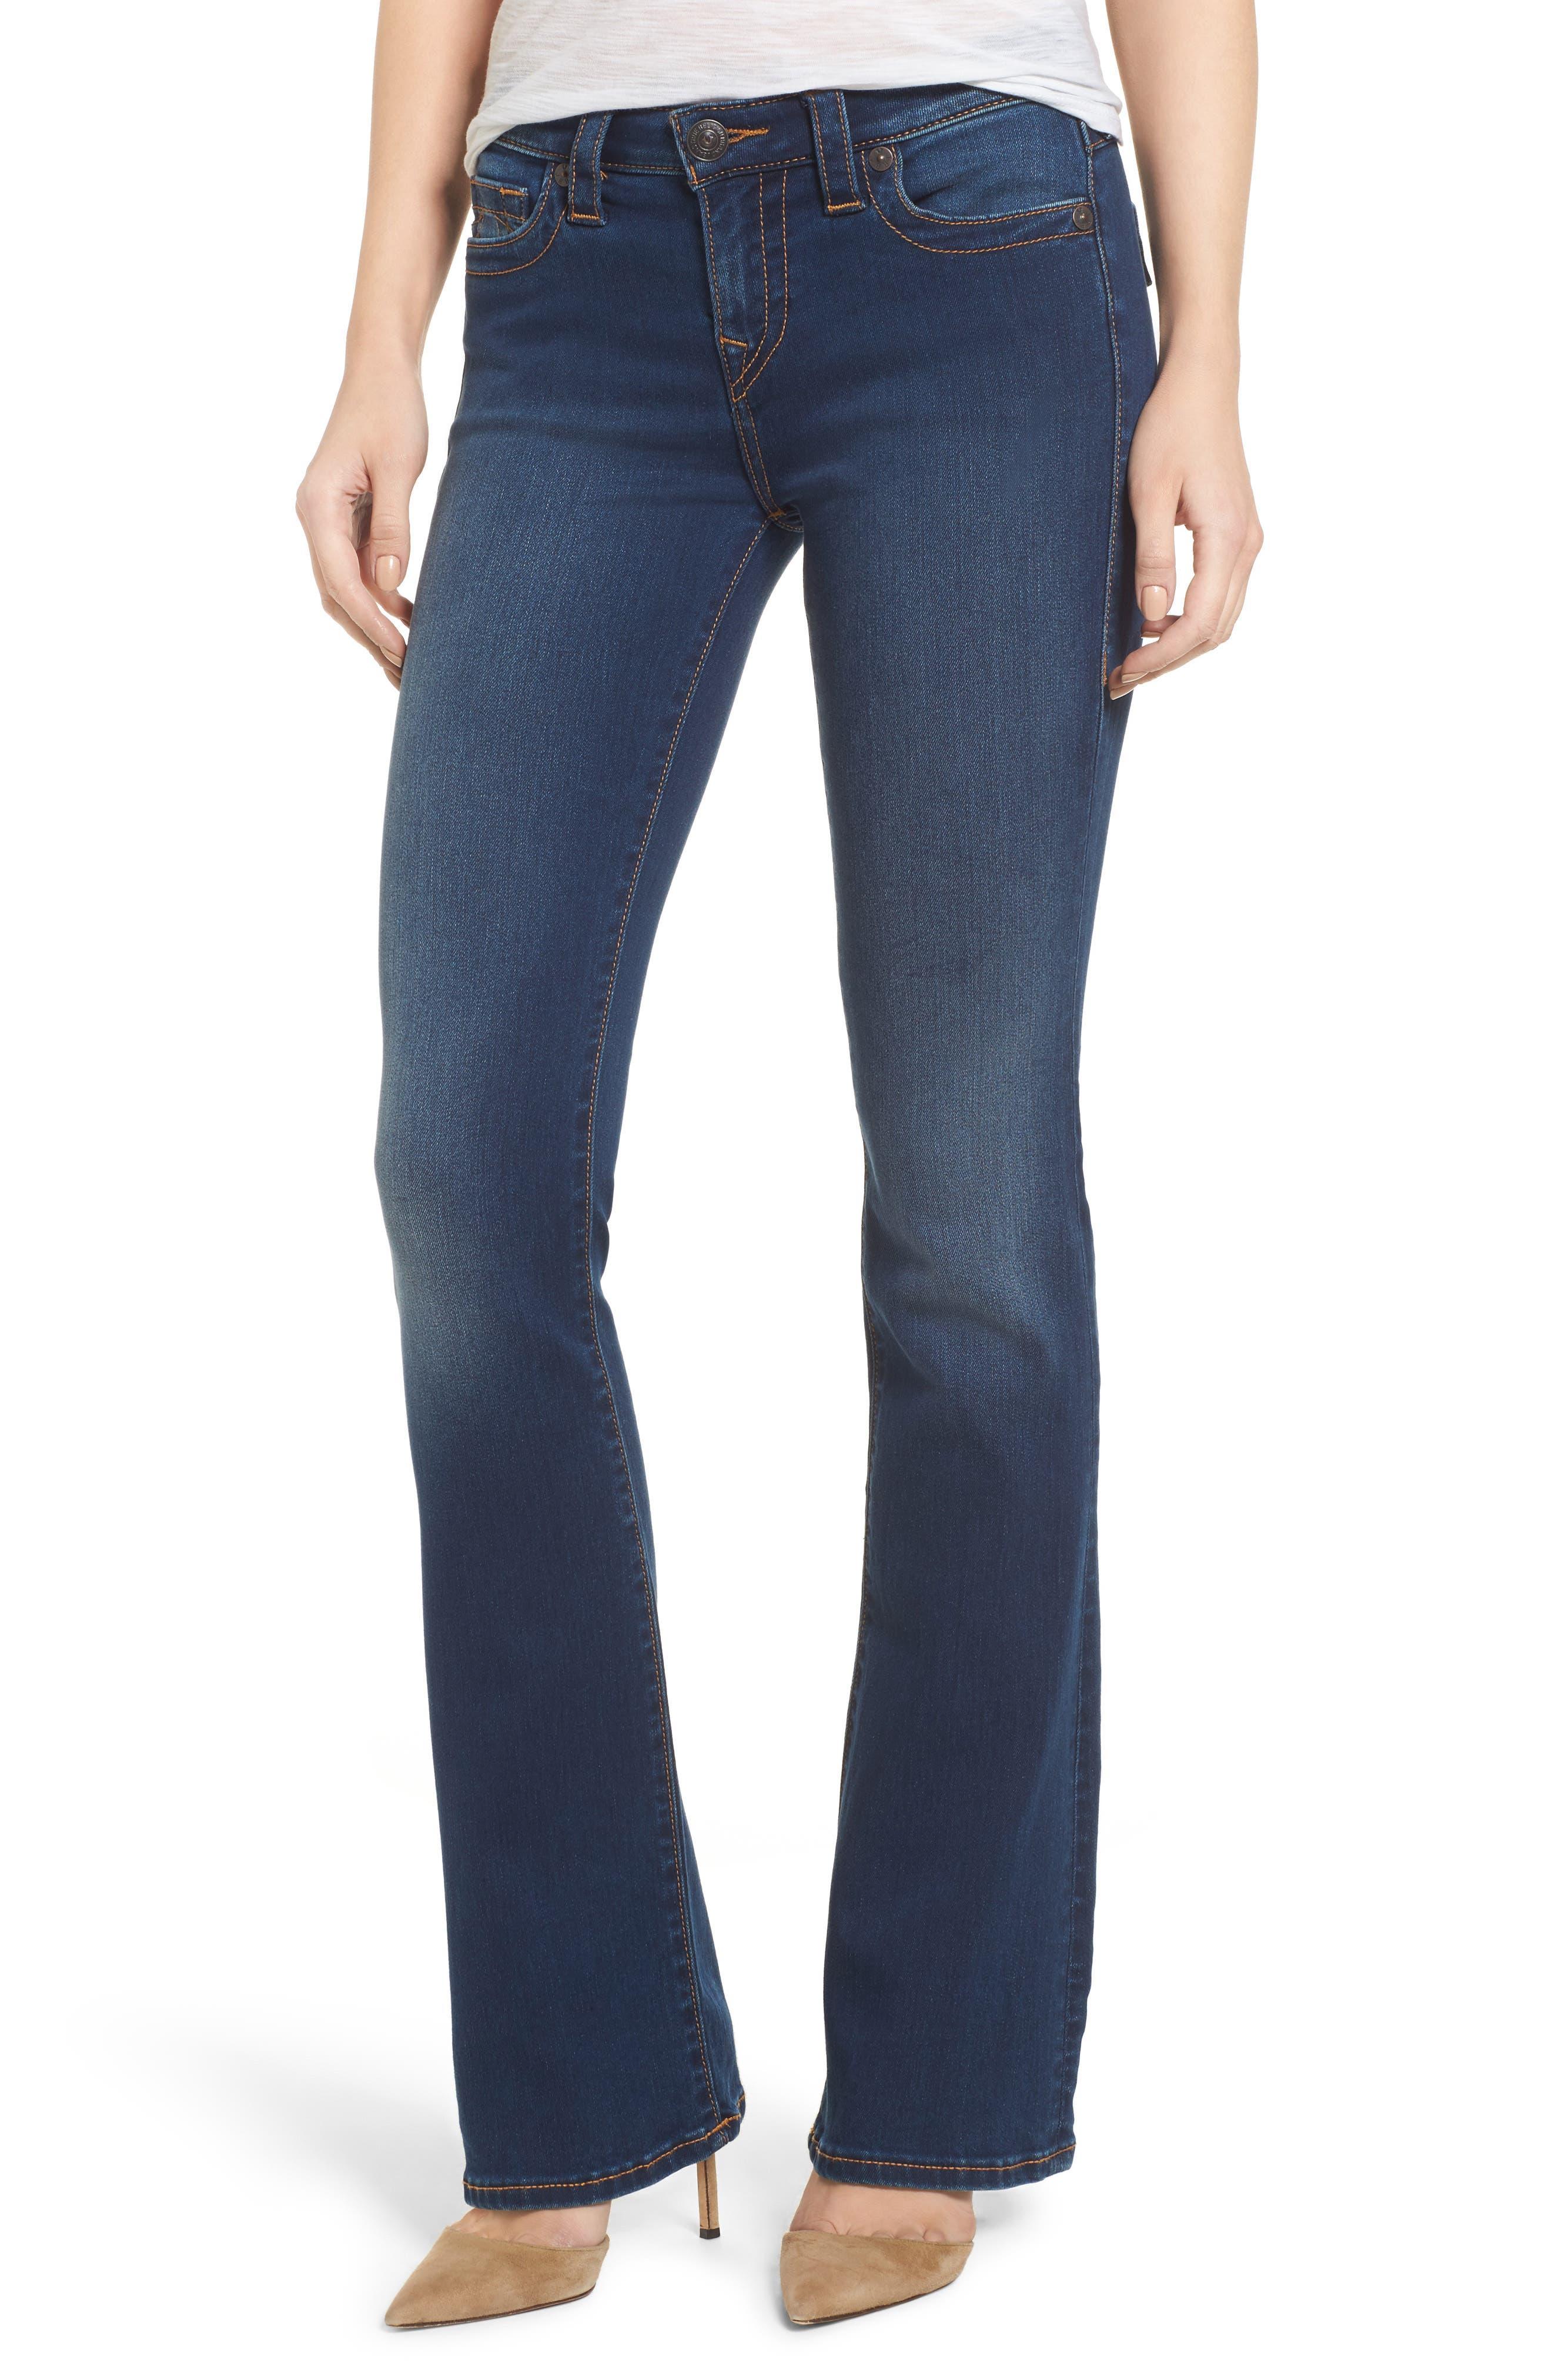 Becca Bootcut Jeans,                         Main,                         color, Lands End Indigo